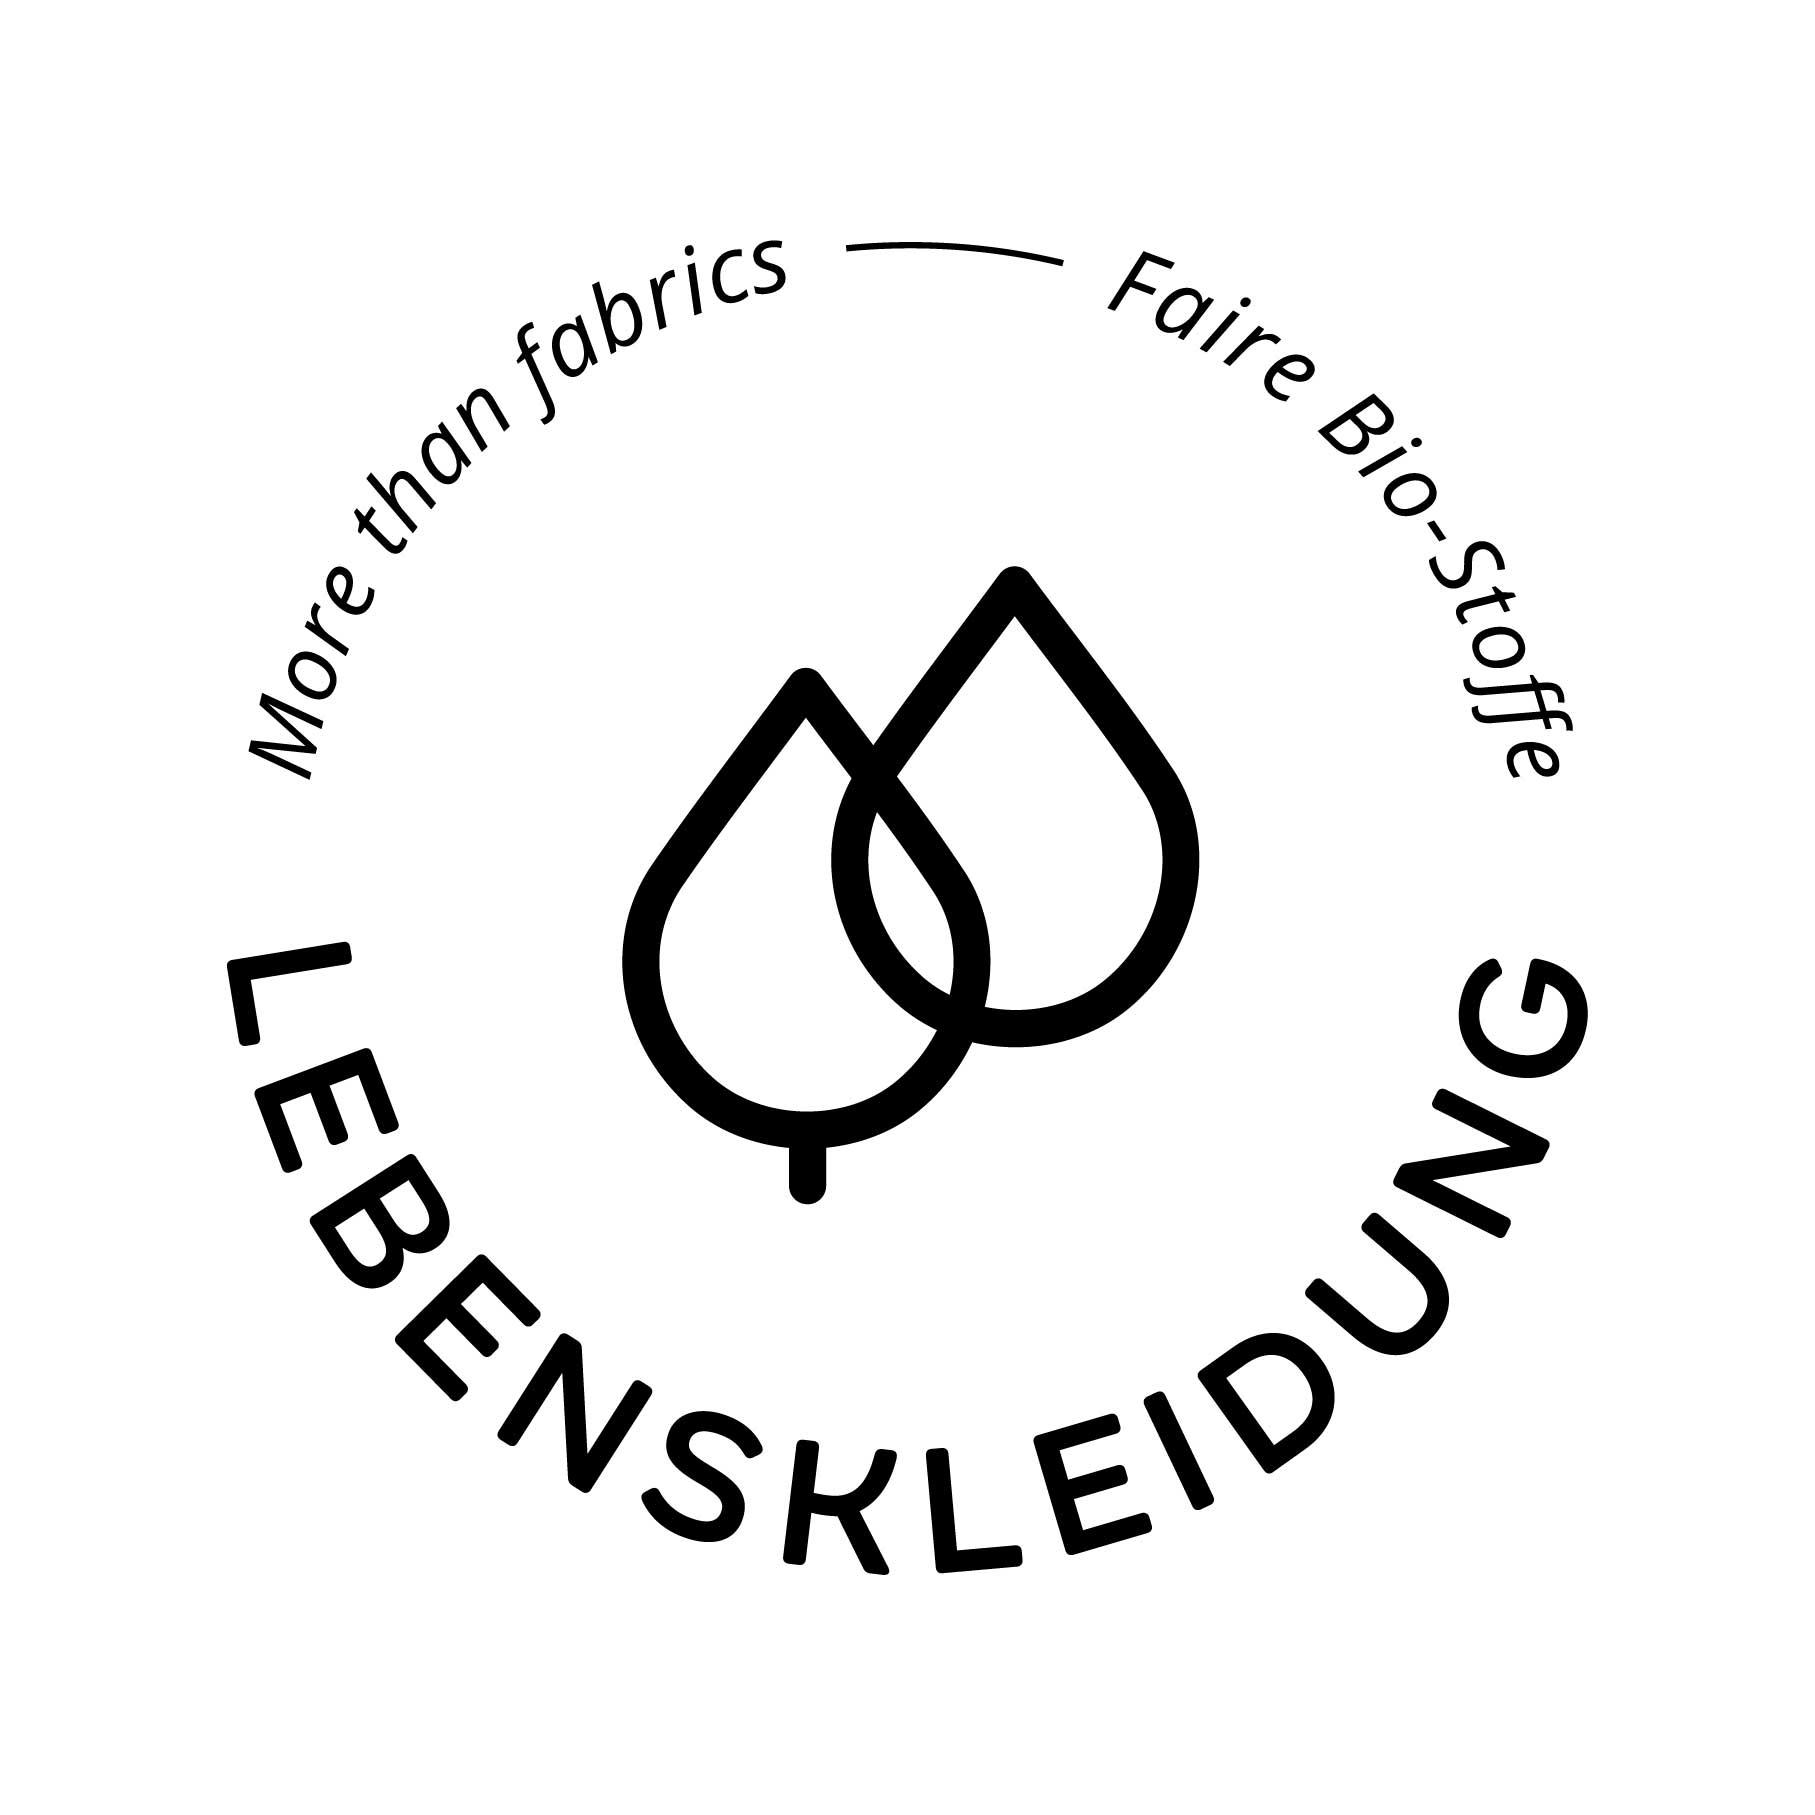 Tela orgánica RIB 2x1 (Puños) - Nude moteado canoso